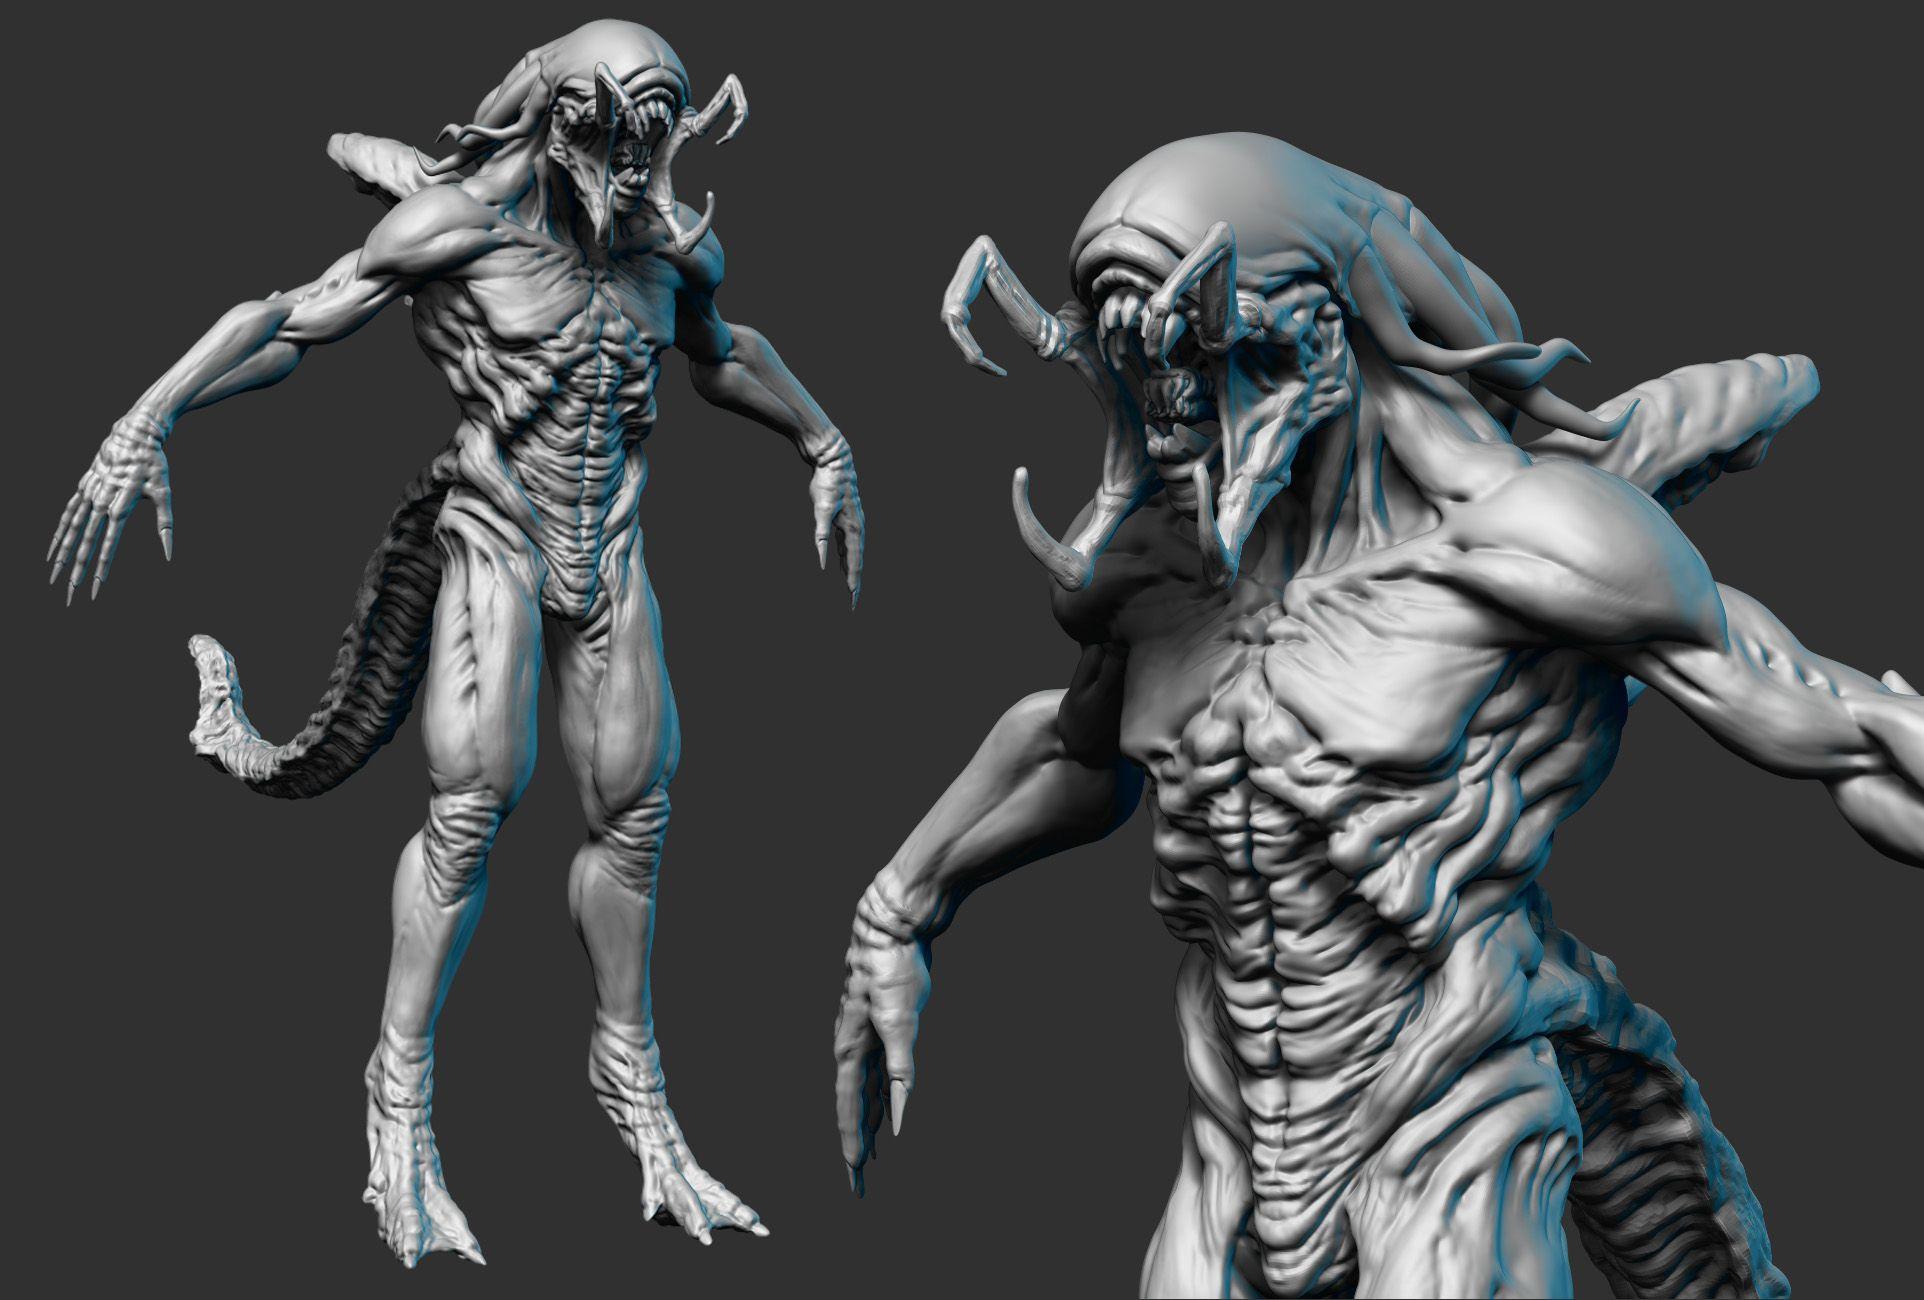 Predalien | Predator alien, Alien art, Alien vs predator